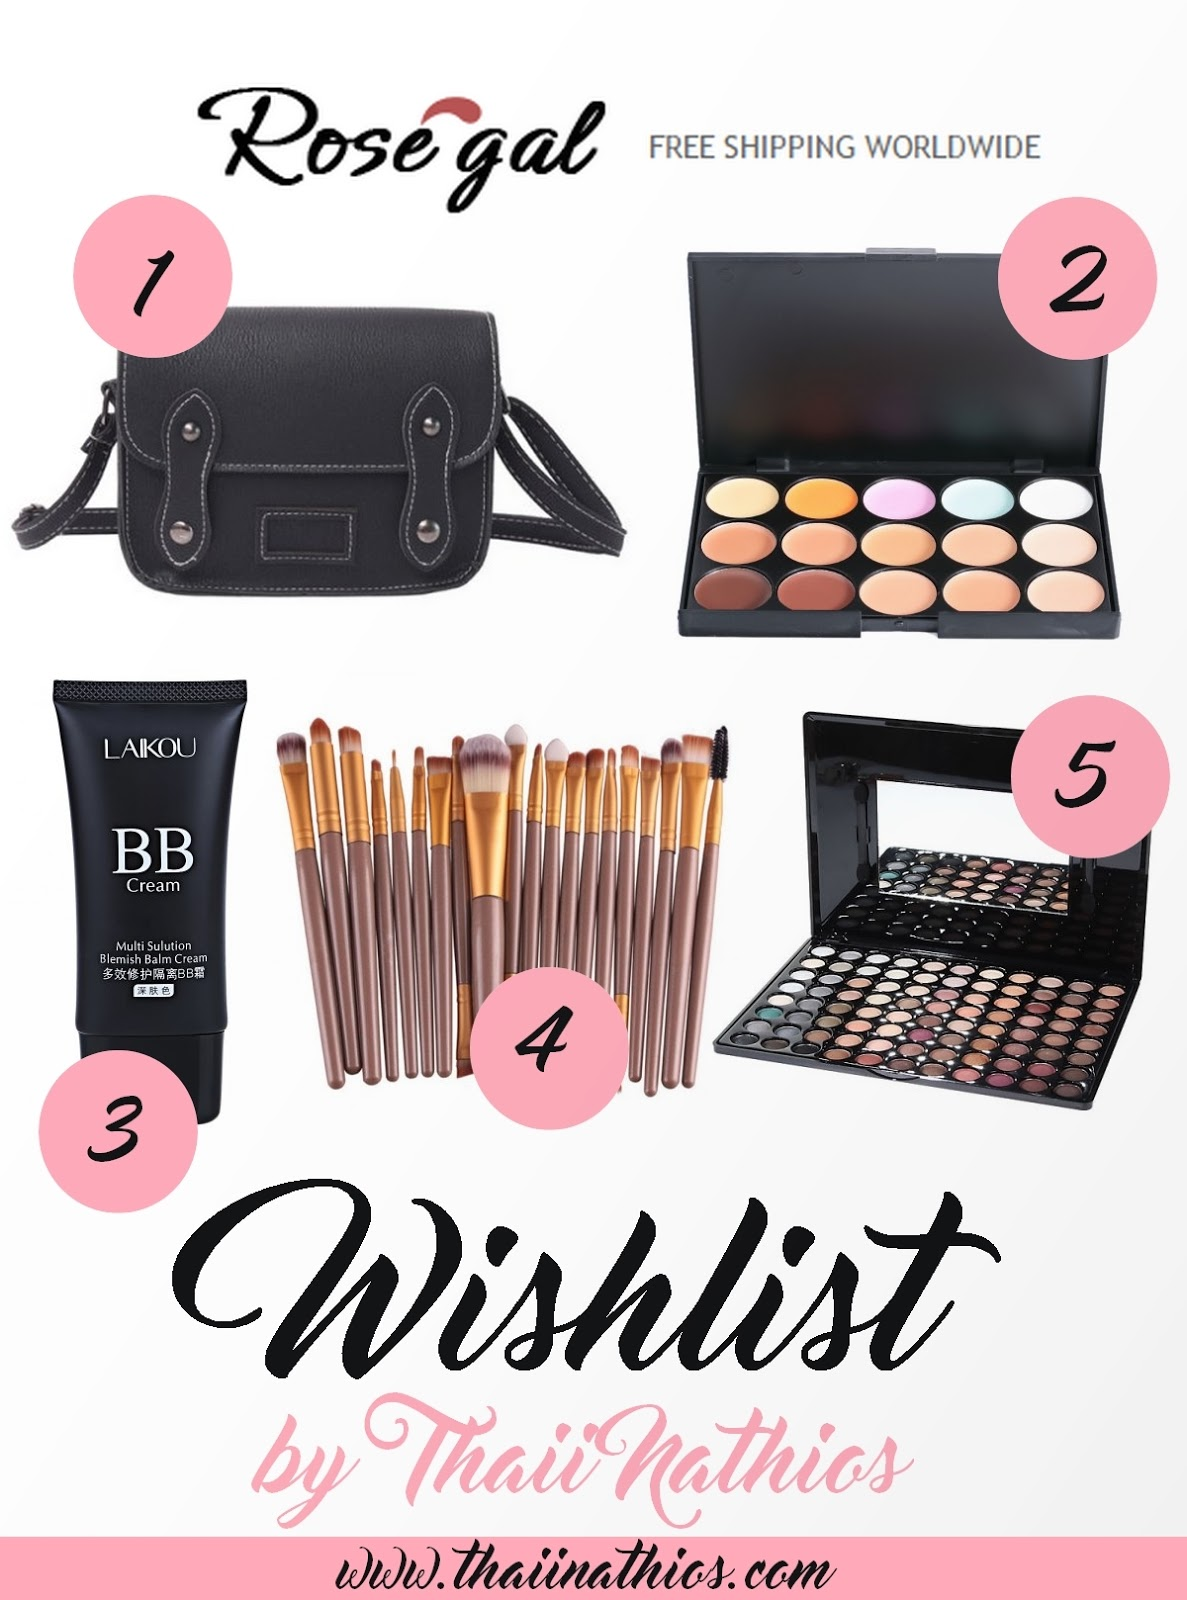 Wishlist Rosegal | Loja Online com Frete Grátis